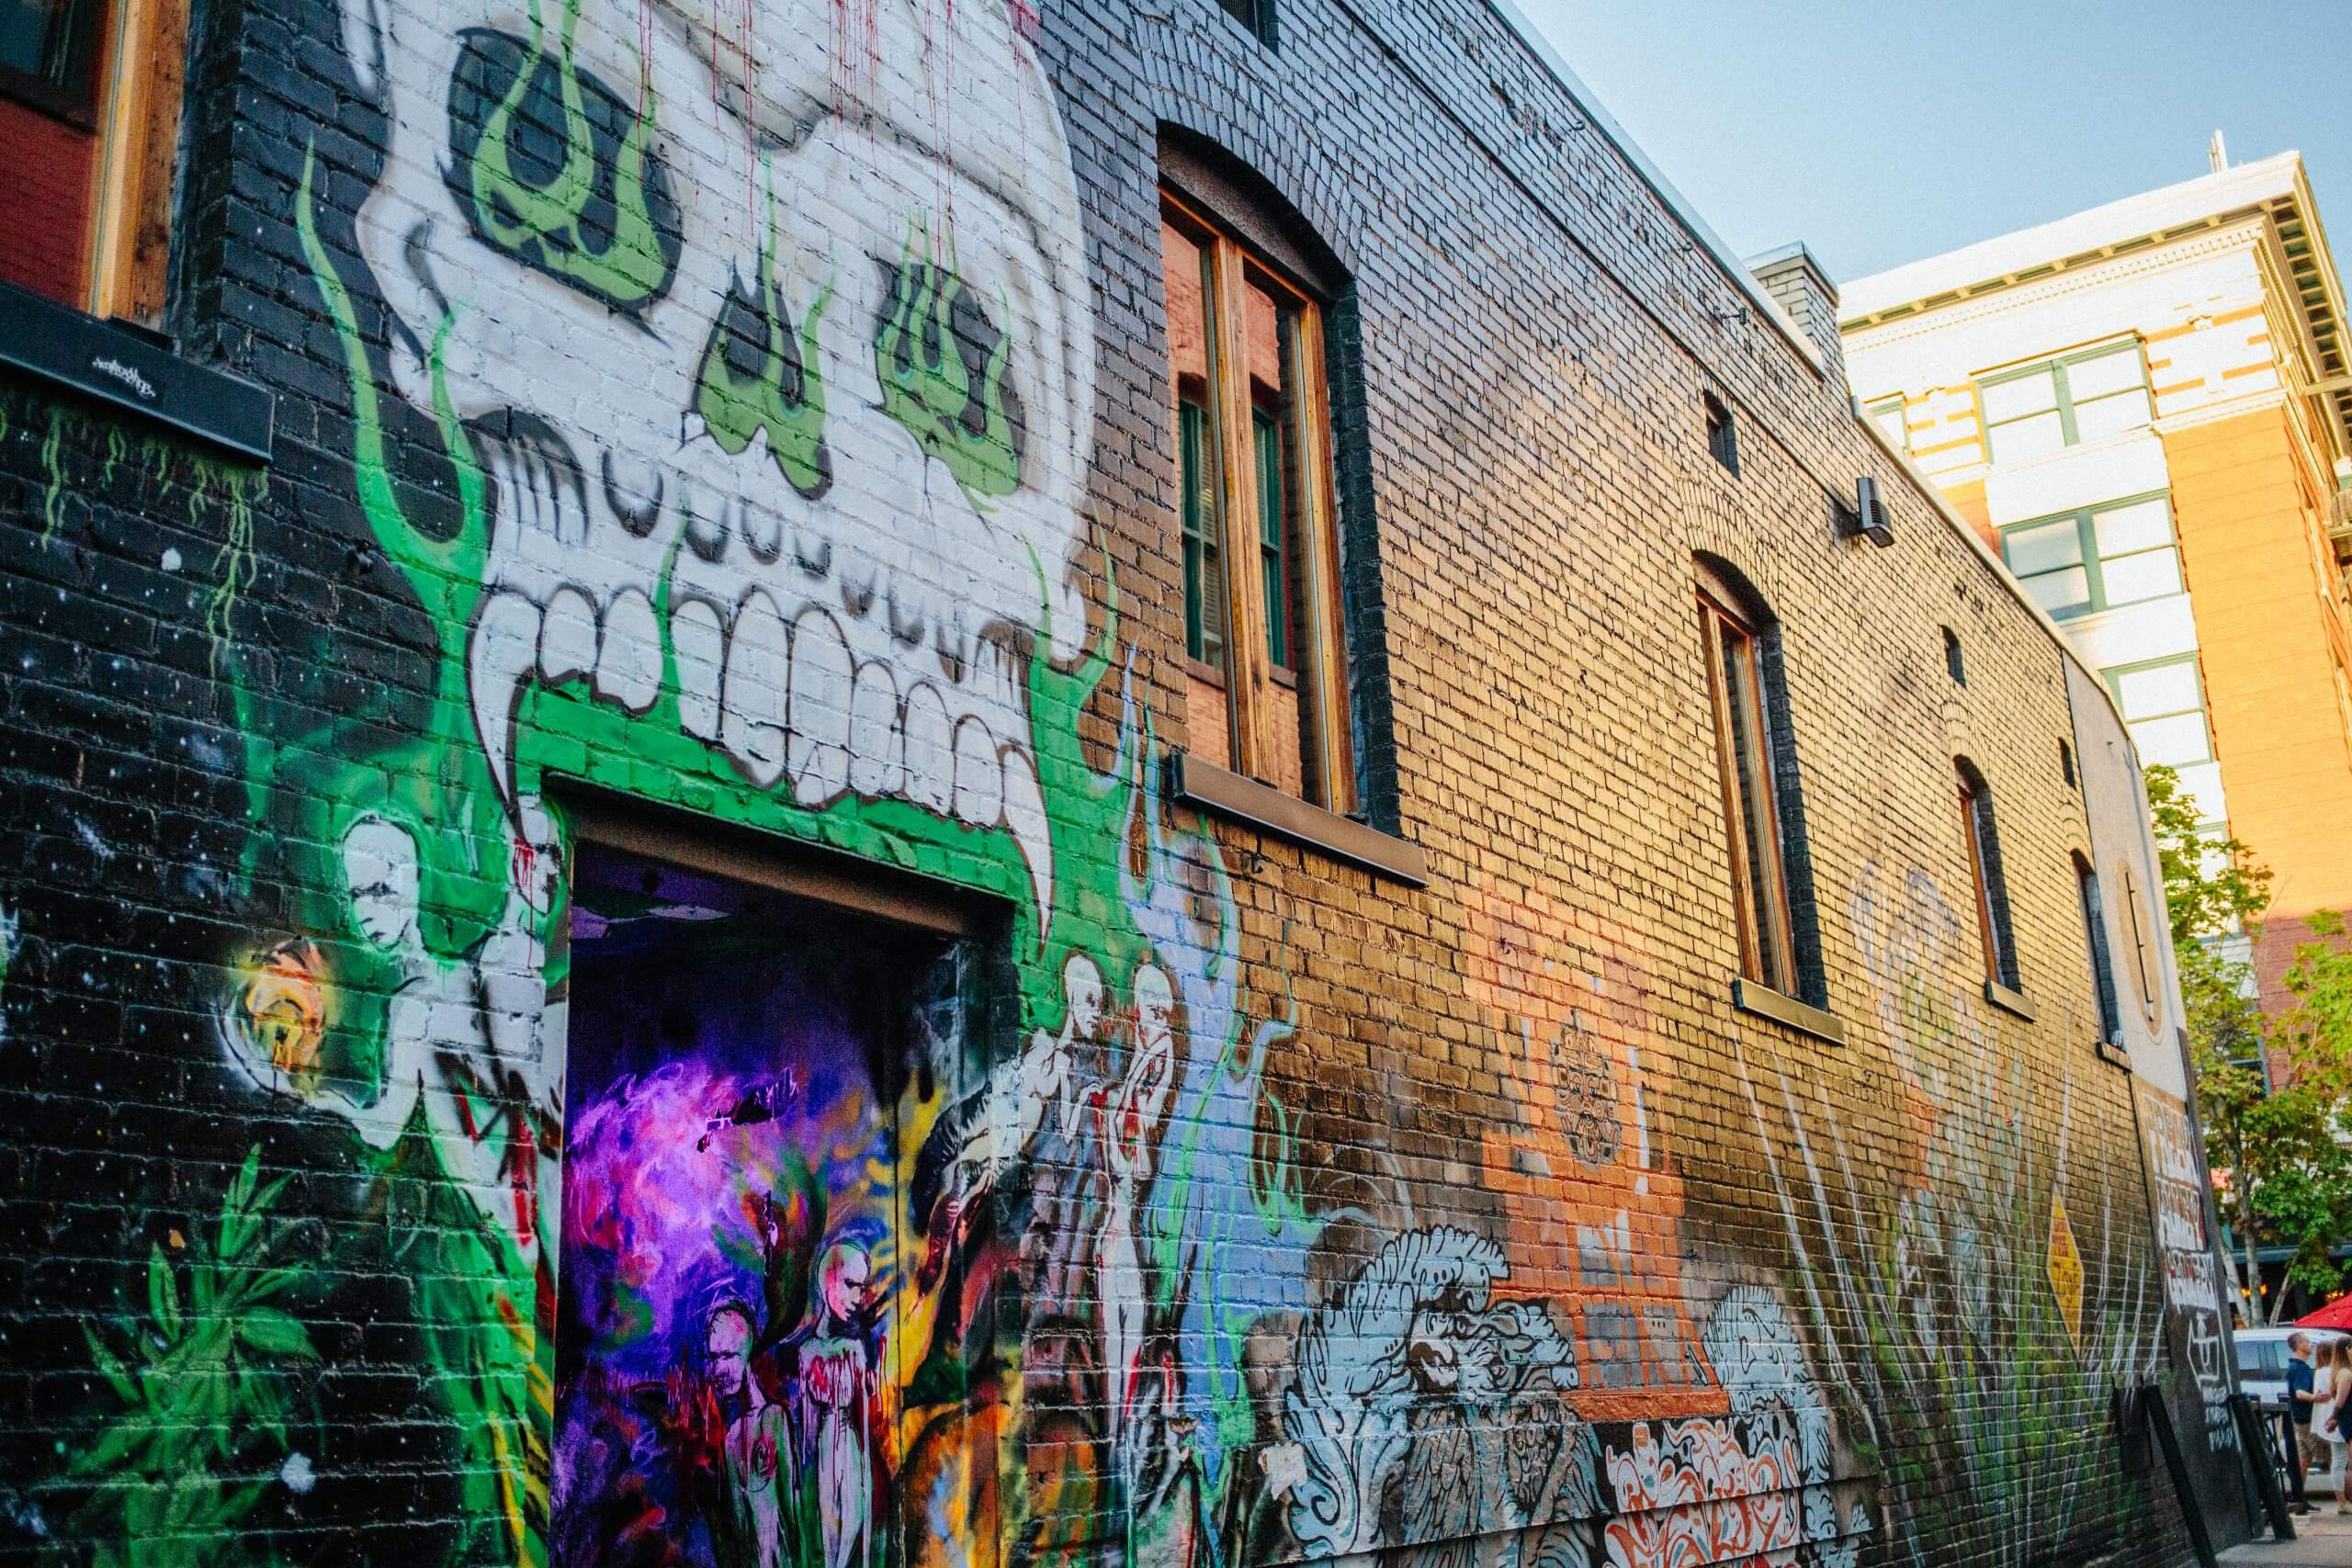 Freak Alley, Boise. Photo Credit: Idaho Tourism.